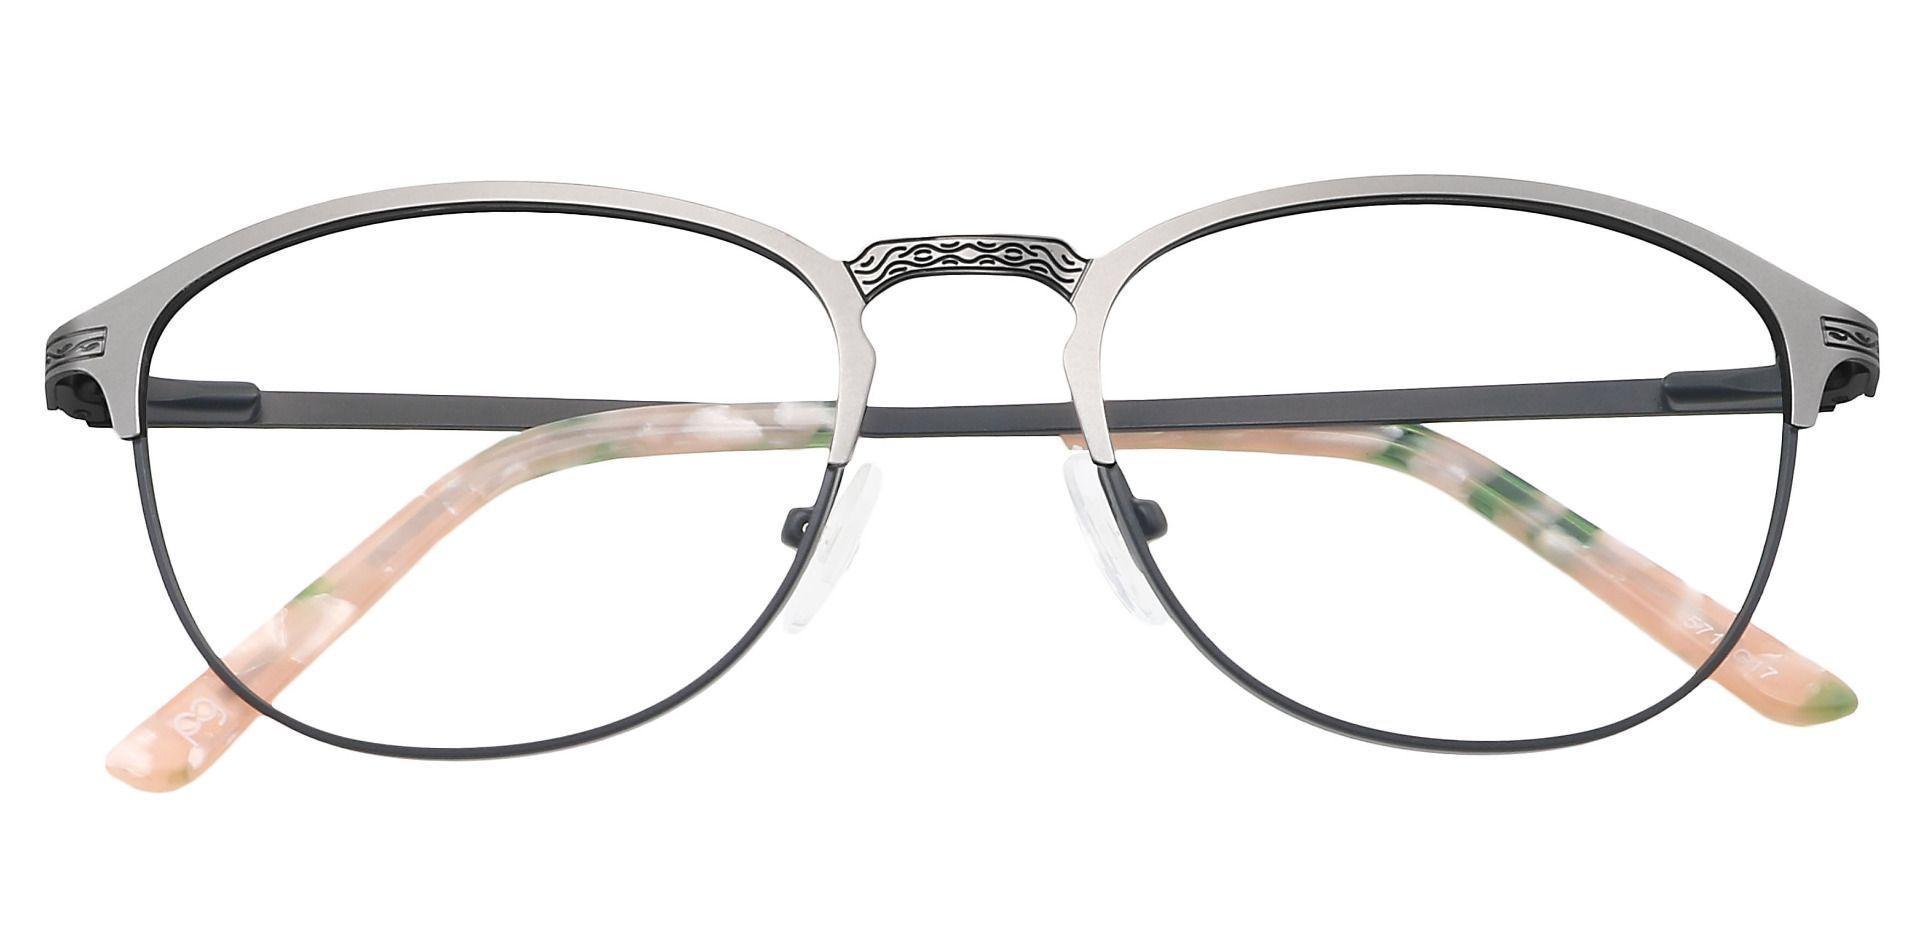 Mari Round Lined Bifocal Glasses - Black